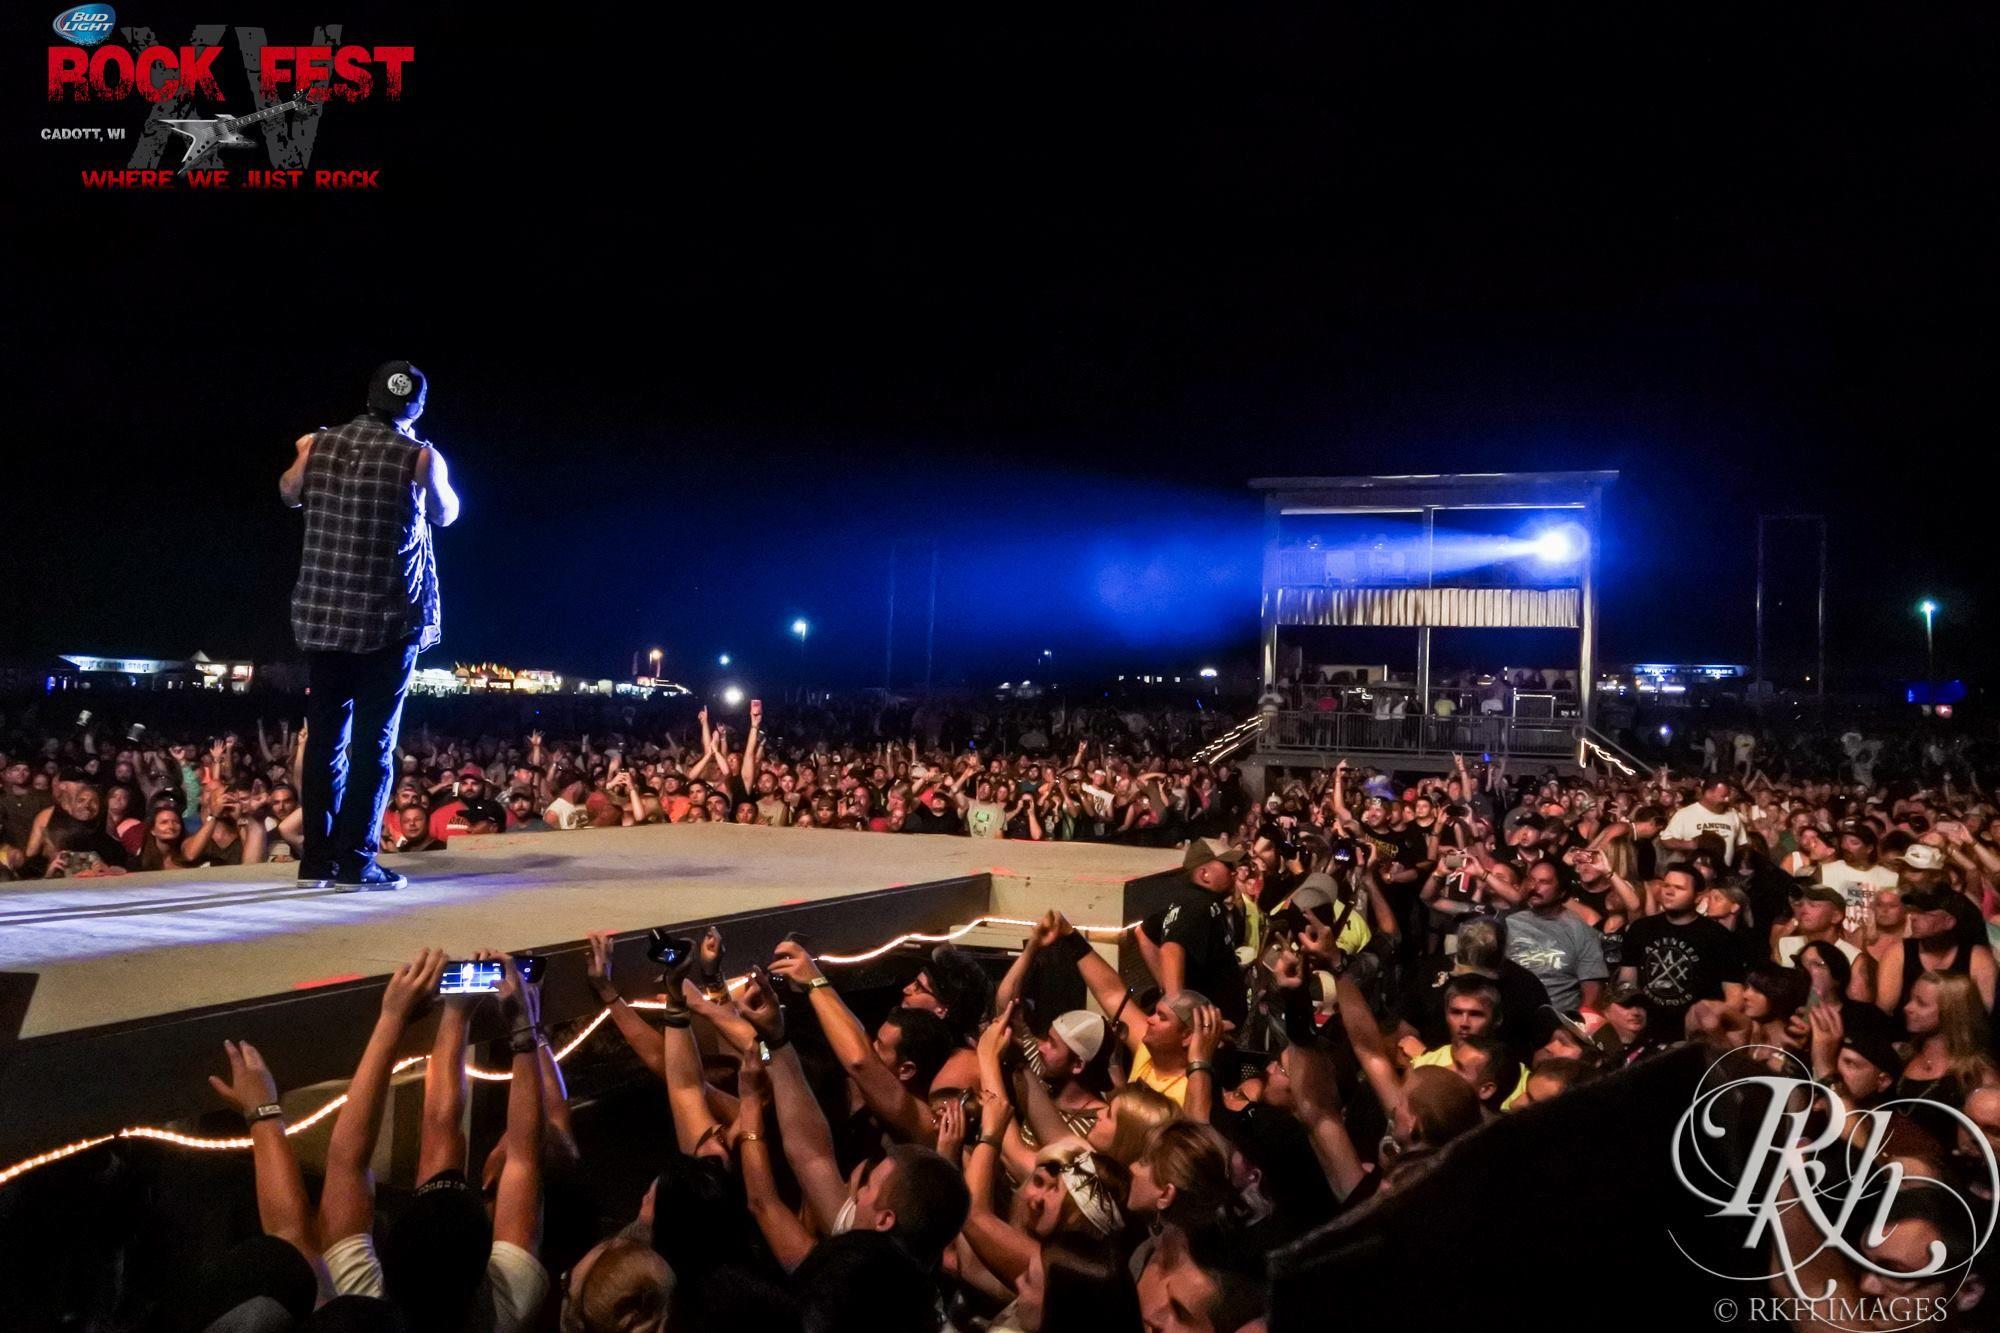 19 de Julio 2015 - Rock Fest (avenged sevenfold, a7x)